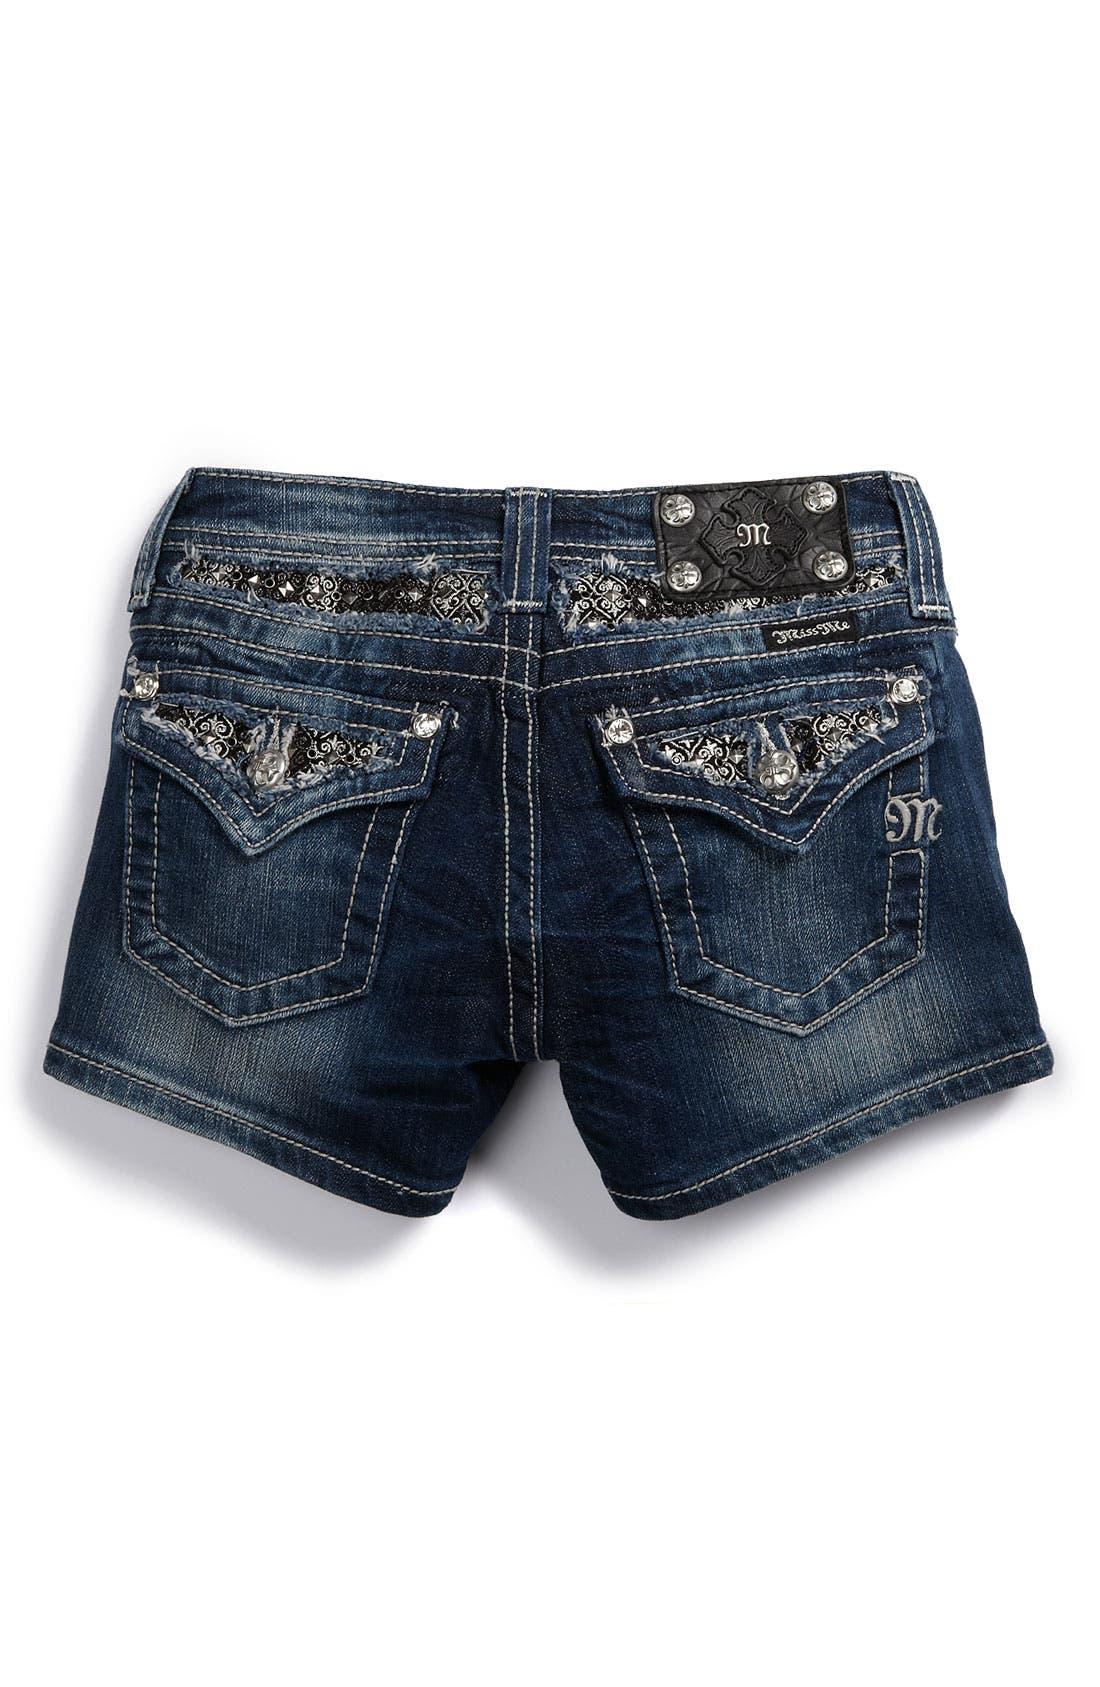 Main Image - Miss Me Pointed Flap Pocket Shorts (Big Girls)